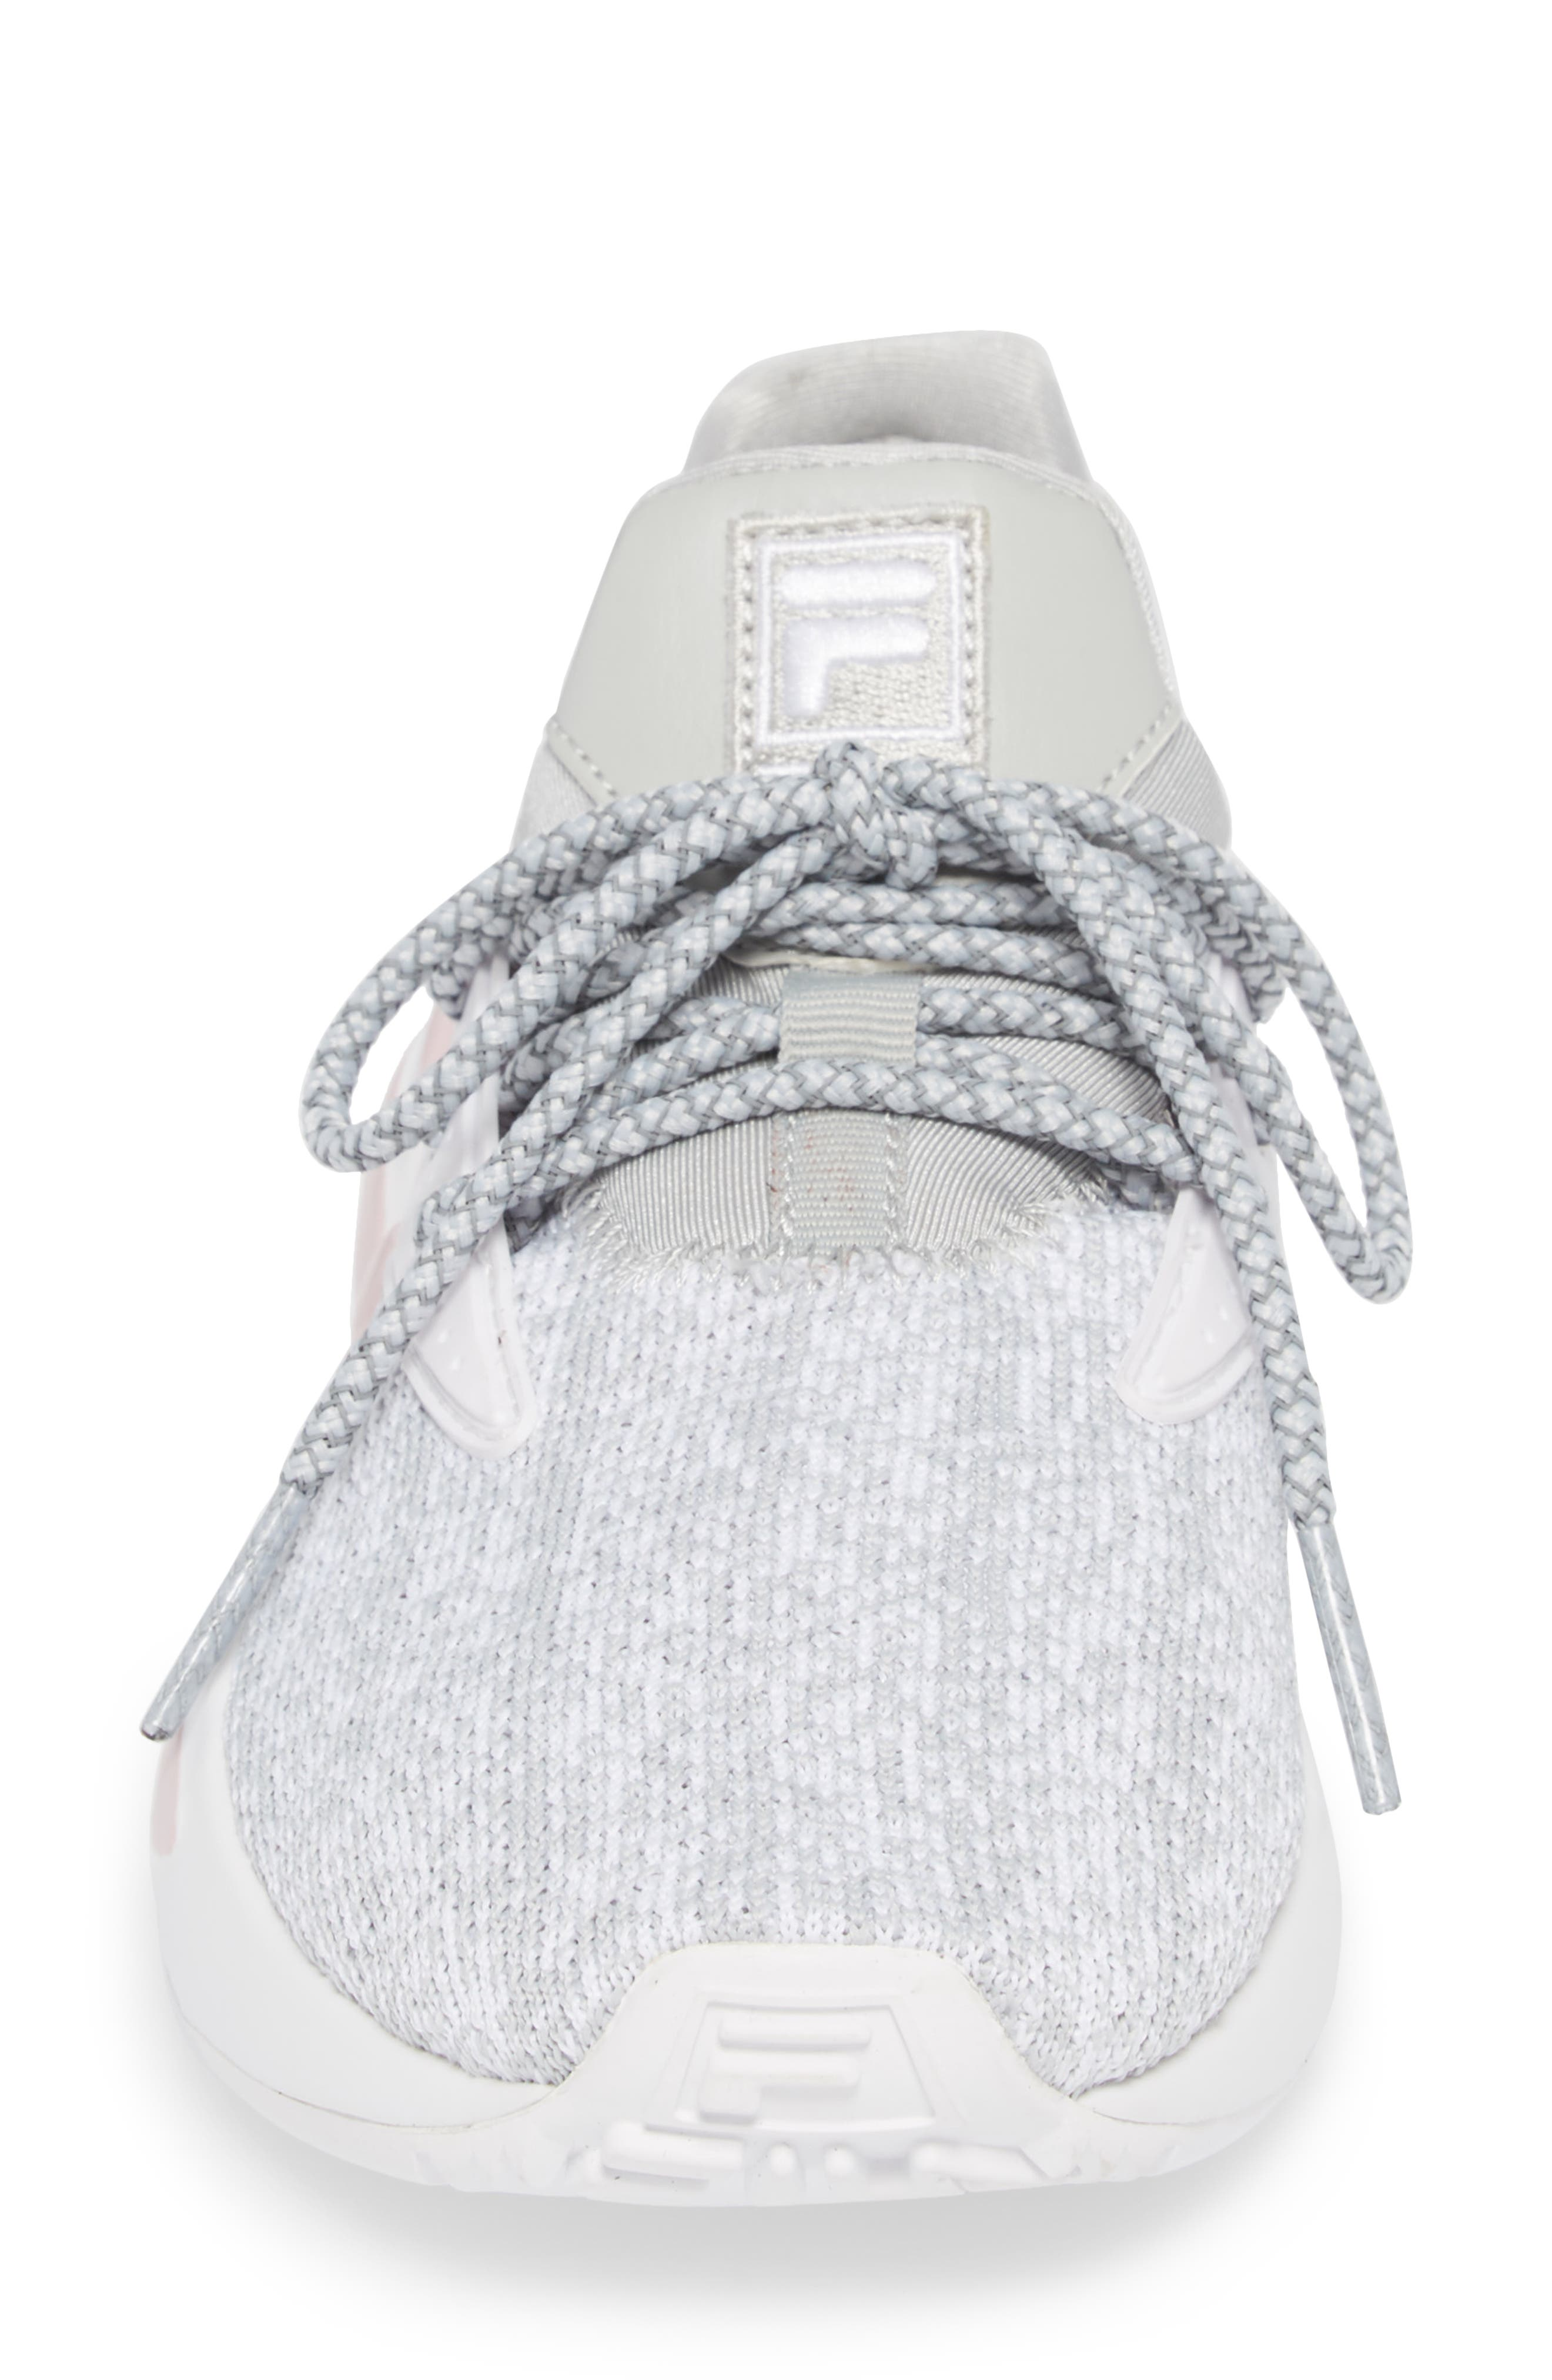 Mindbreaker 2.0 Sneaker,                             Alternate thumbnail 4, color,                             HIGHRISE/ WHITE/ CHALK PINK